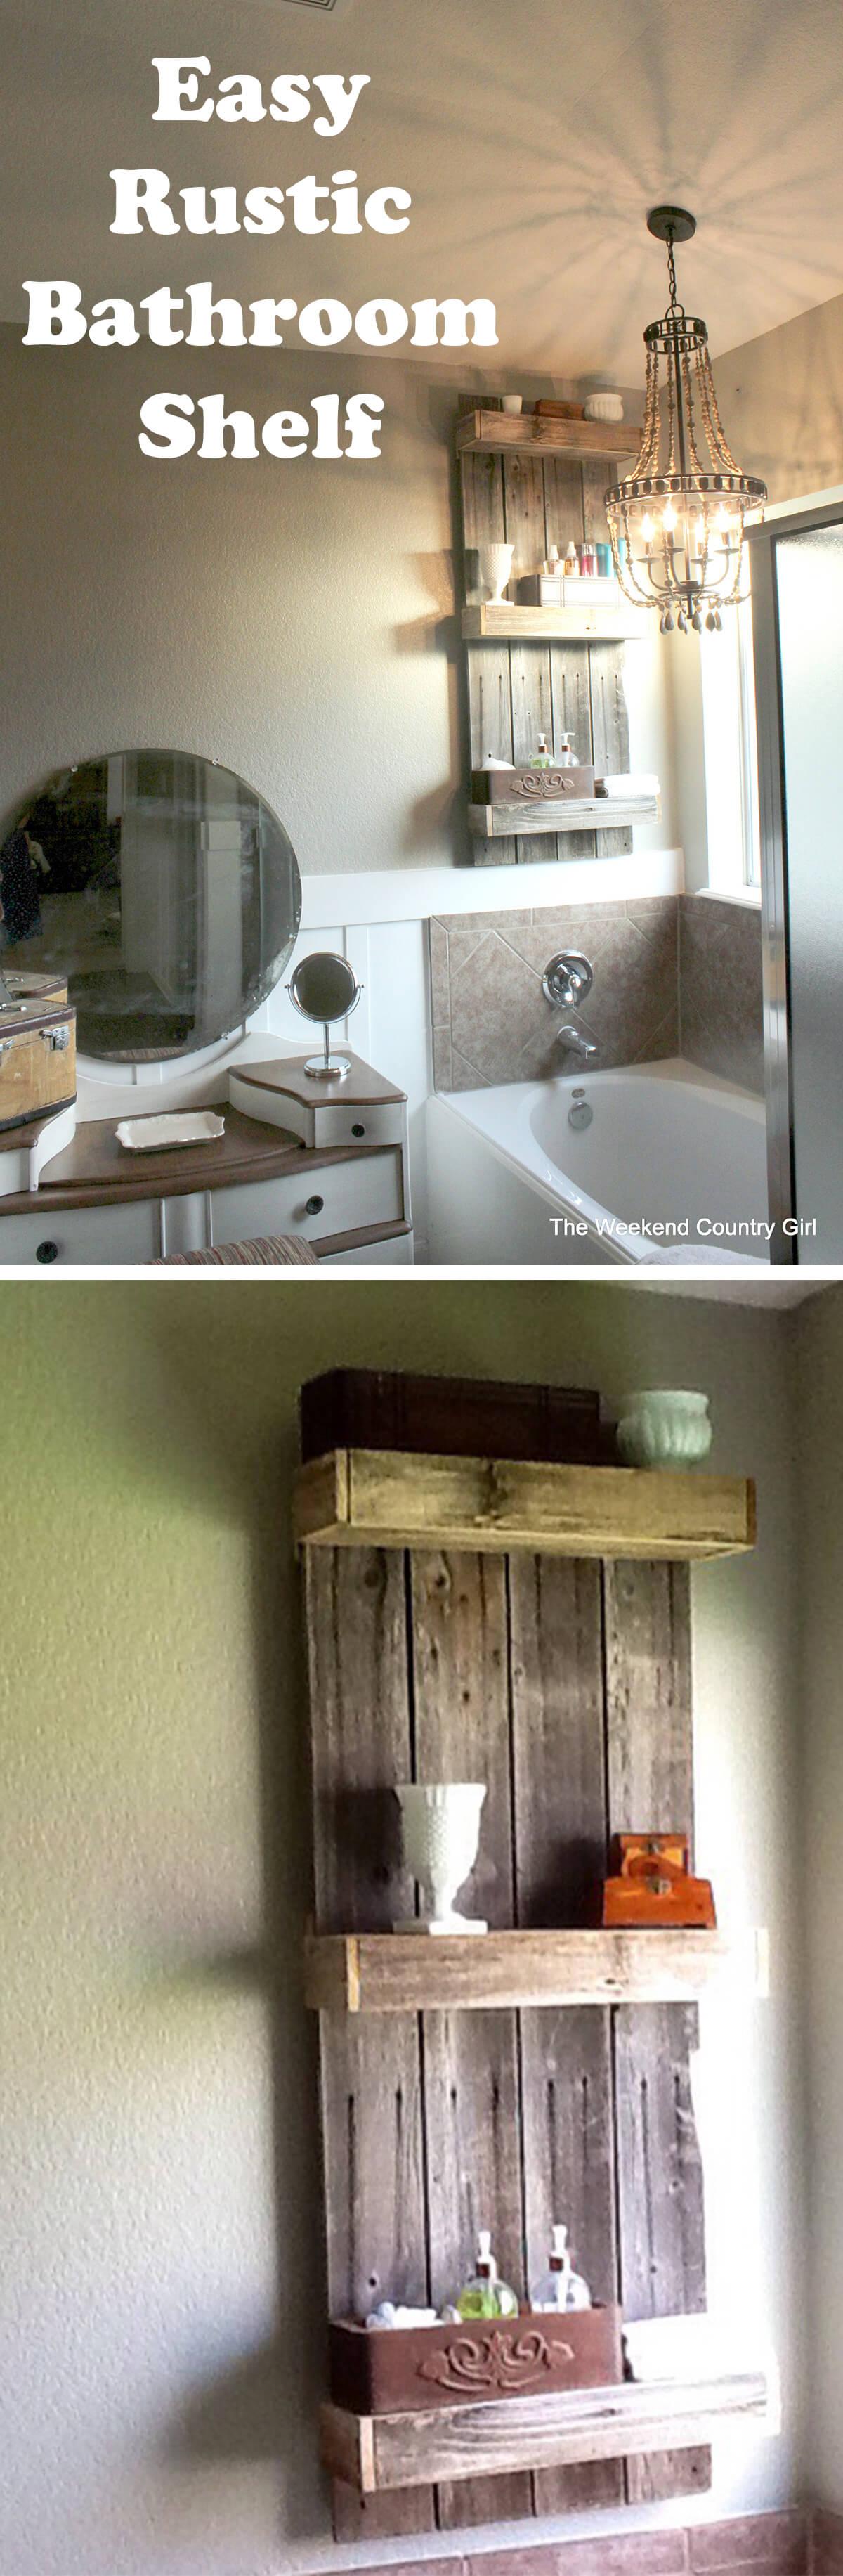 Prairie Home Companion Hanging Shelf